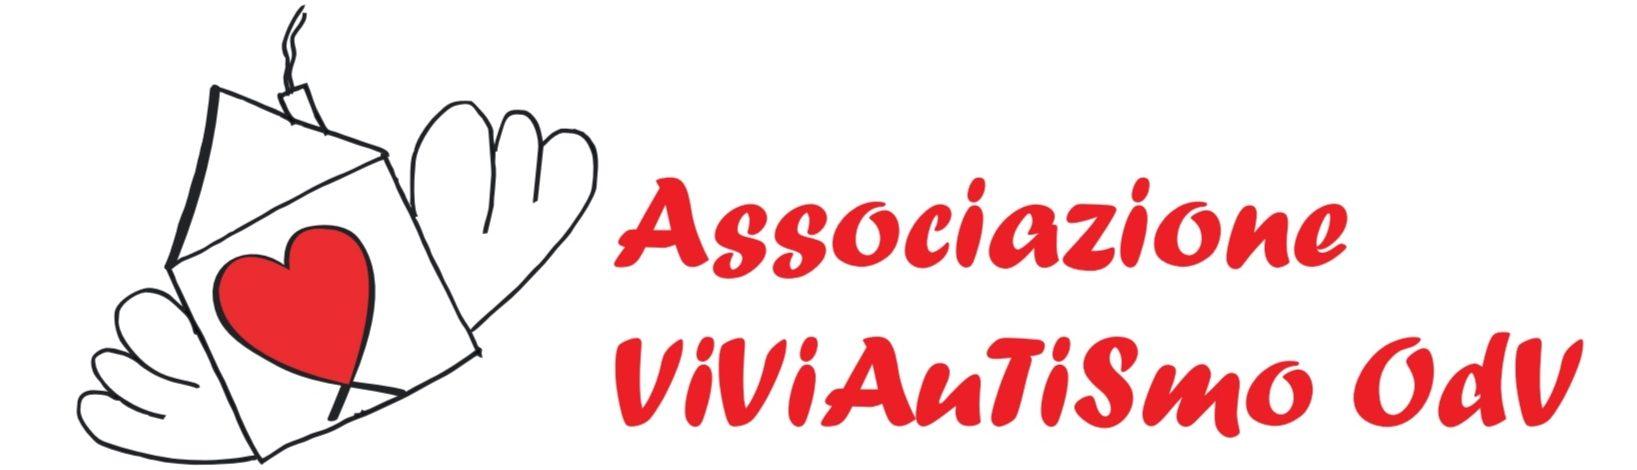 Associazione VIviAutismo ODV